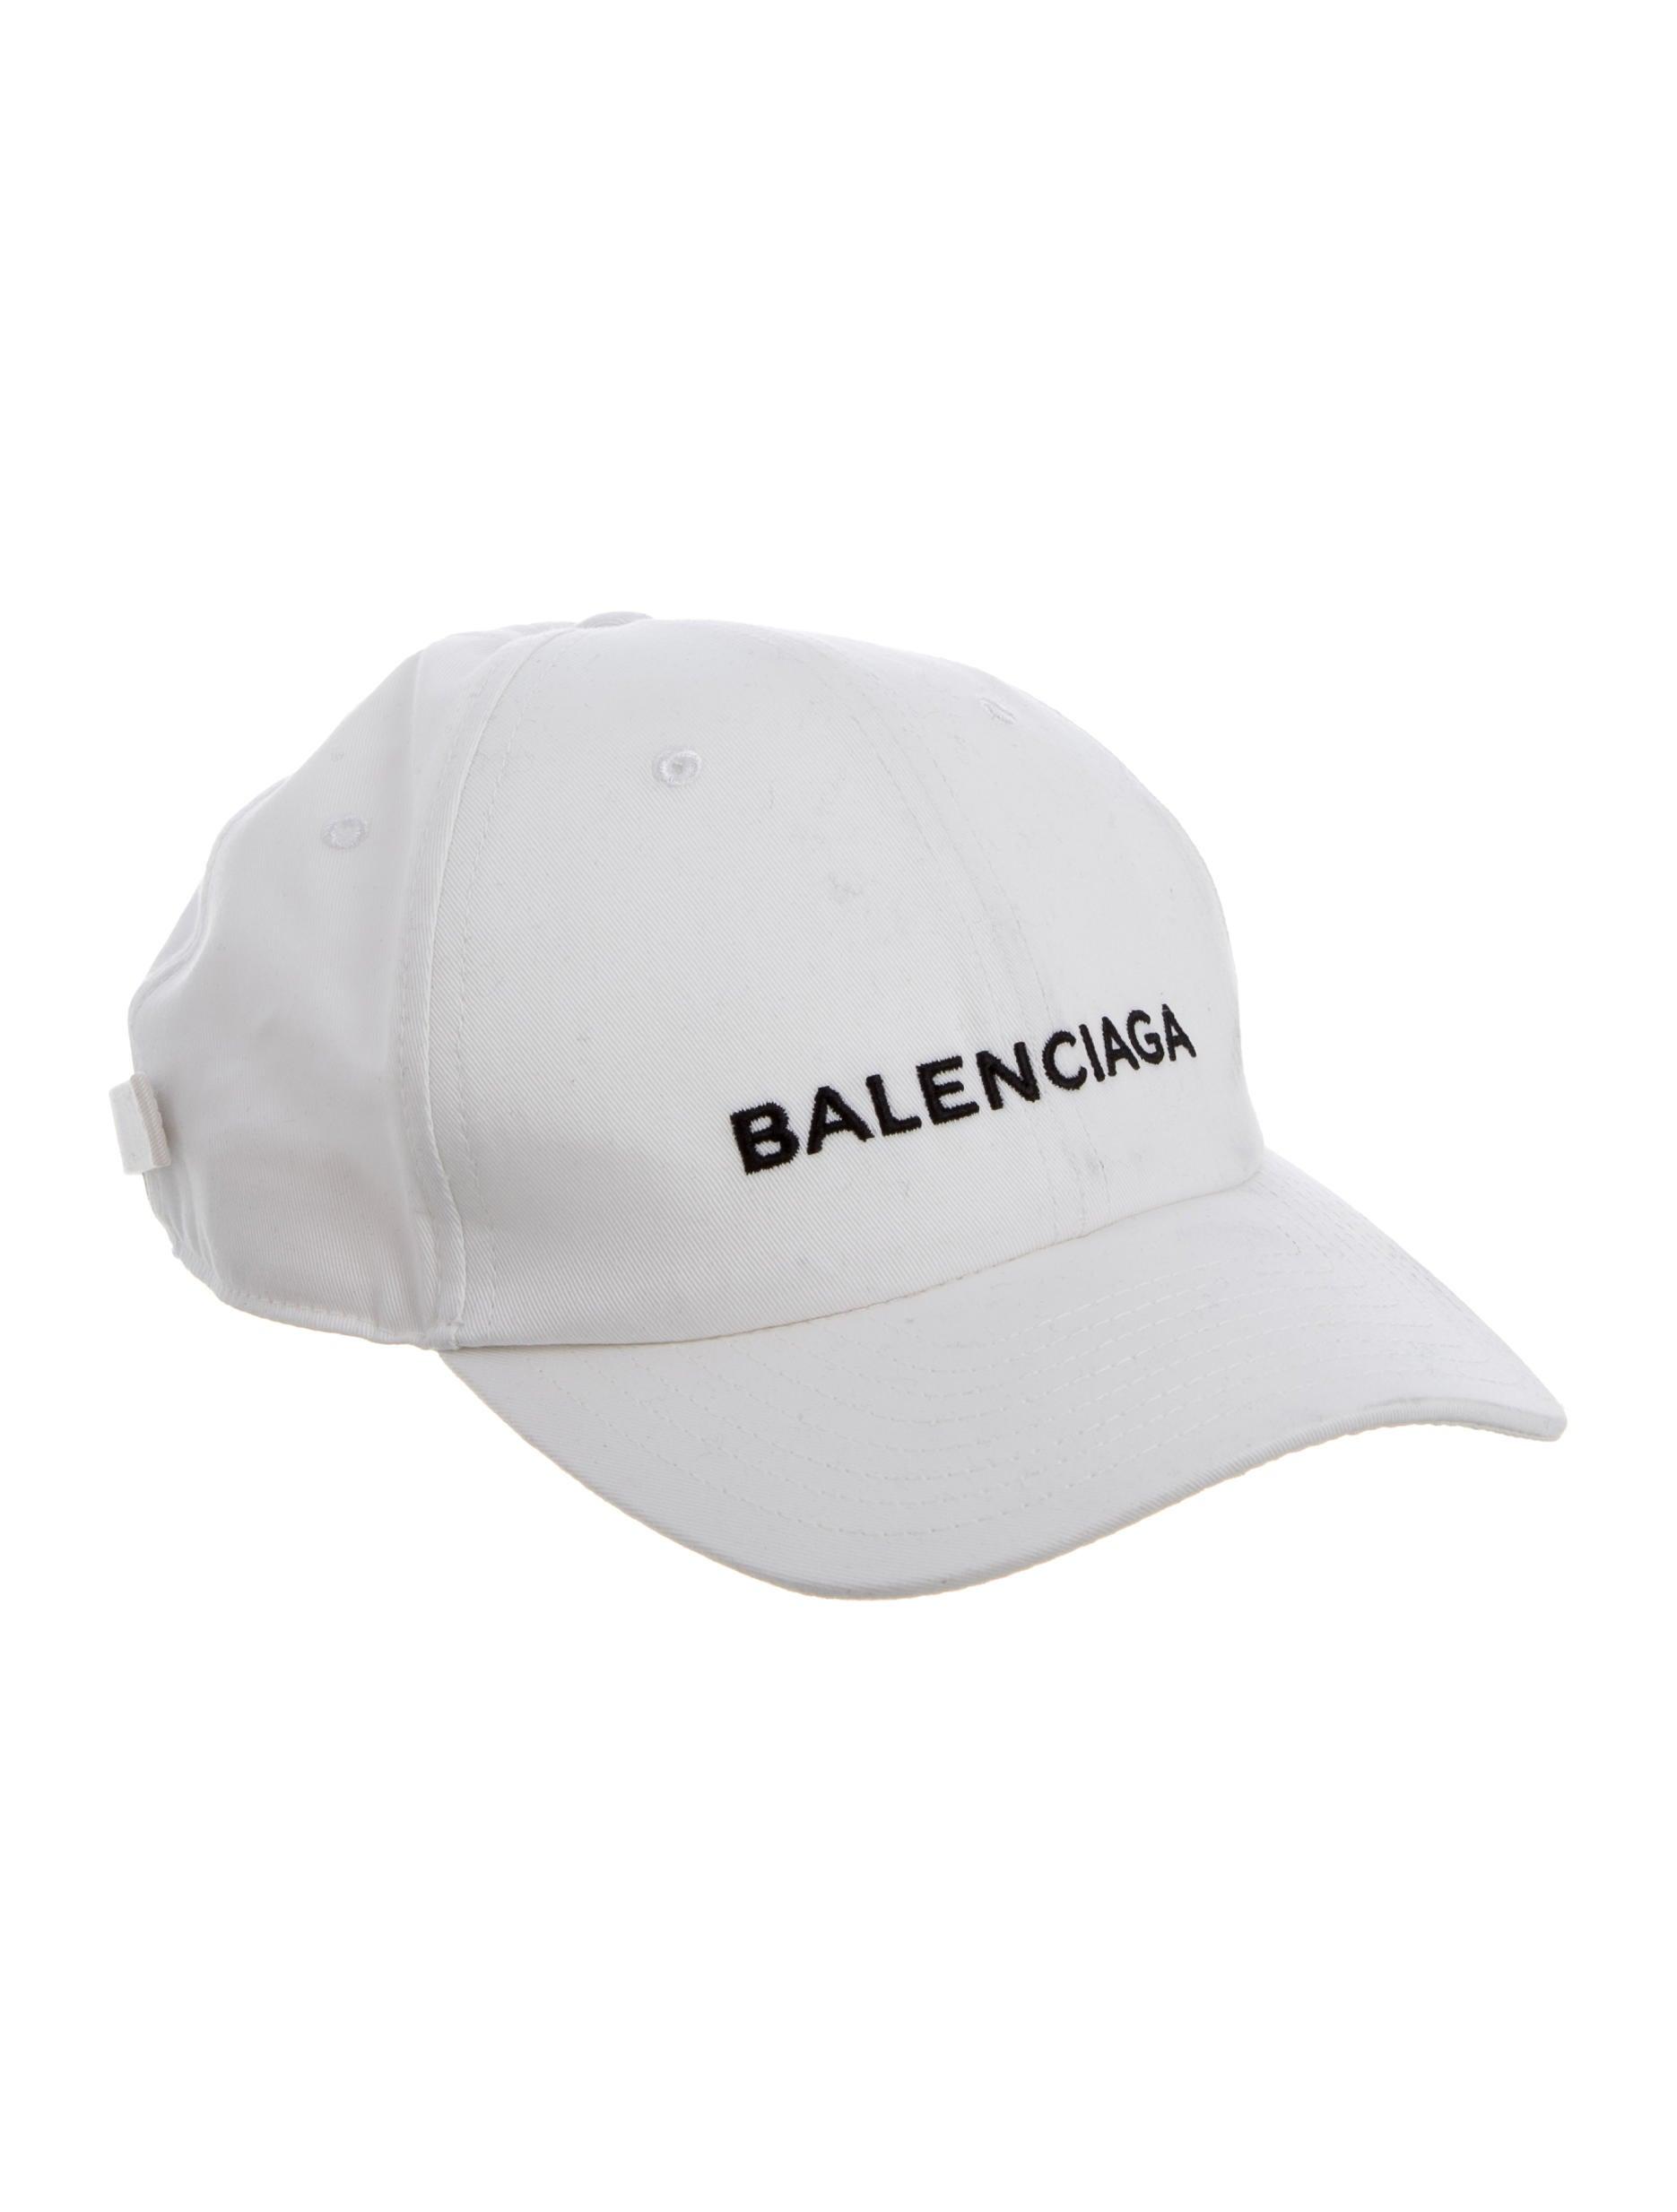 3443b628129cf Balenciaga Logo Baseball Cap - Accessories - BAL45003